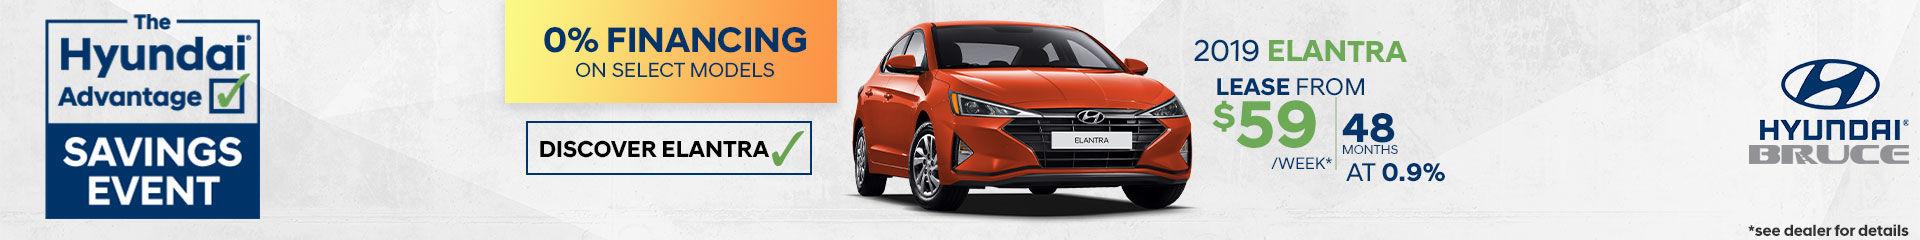 Lease the 2019 Hyundai Elantra